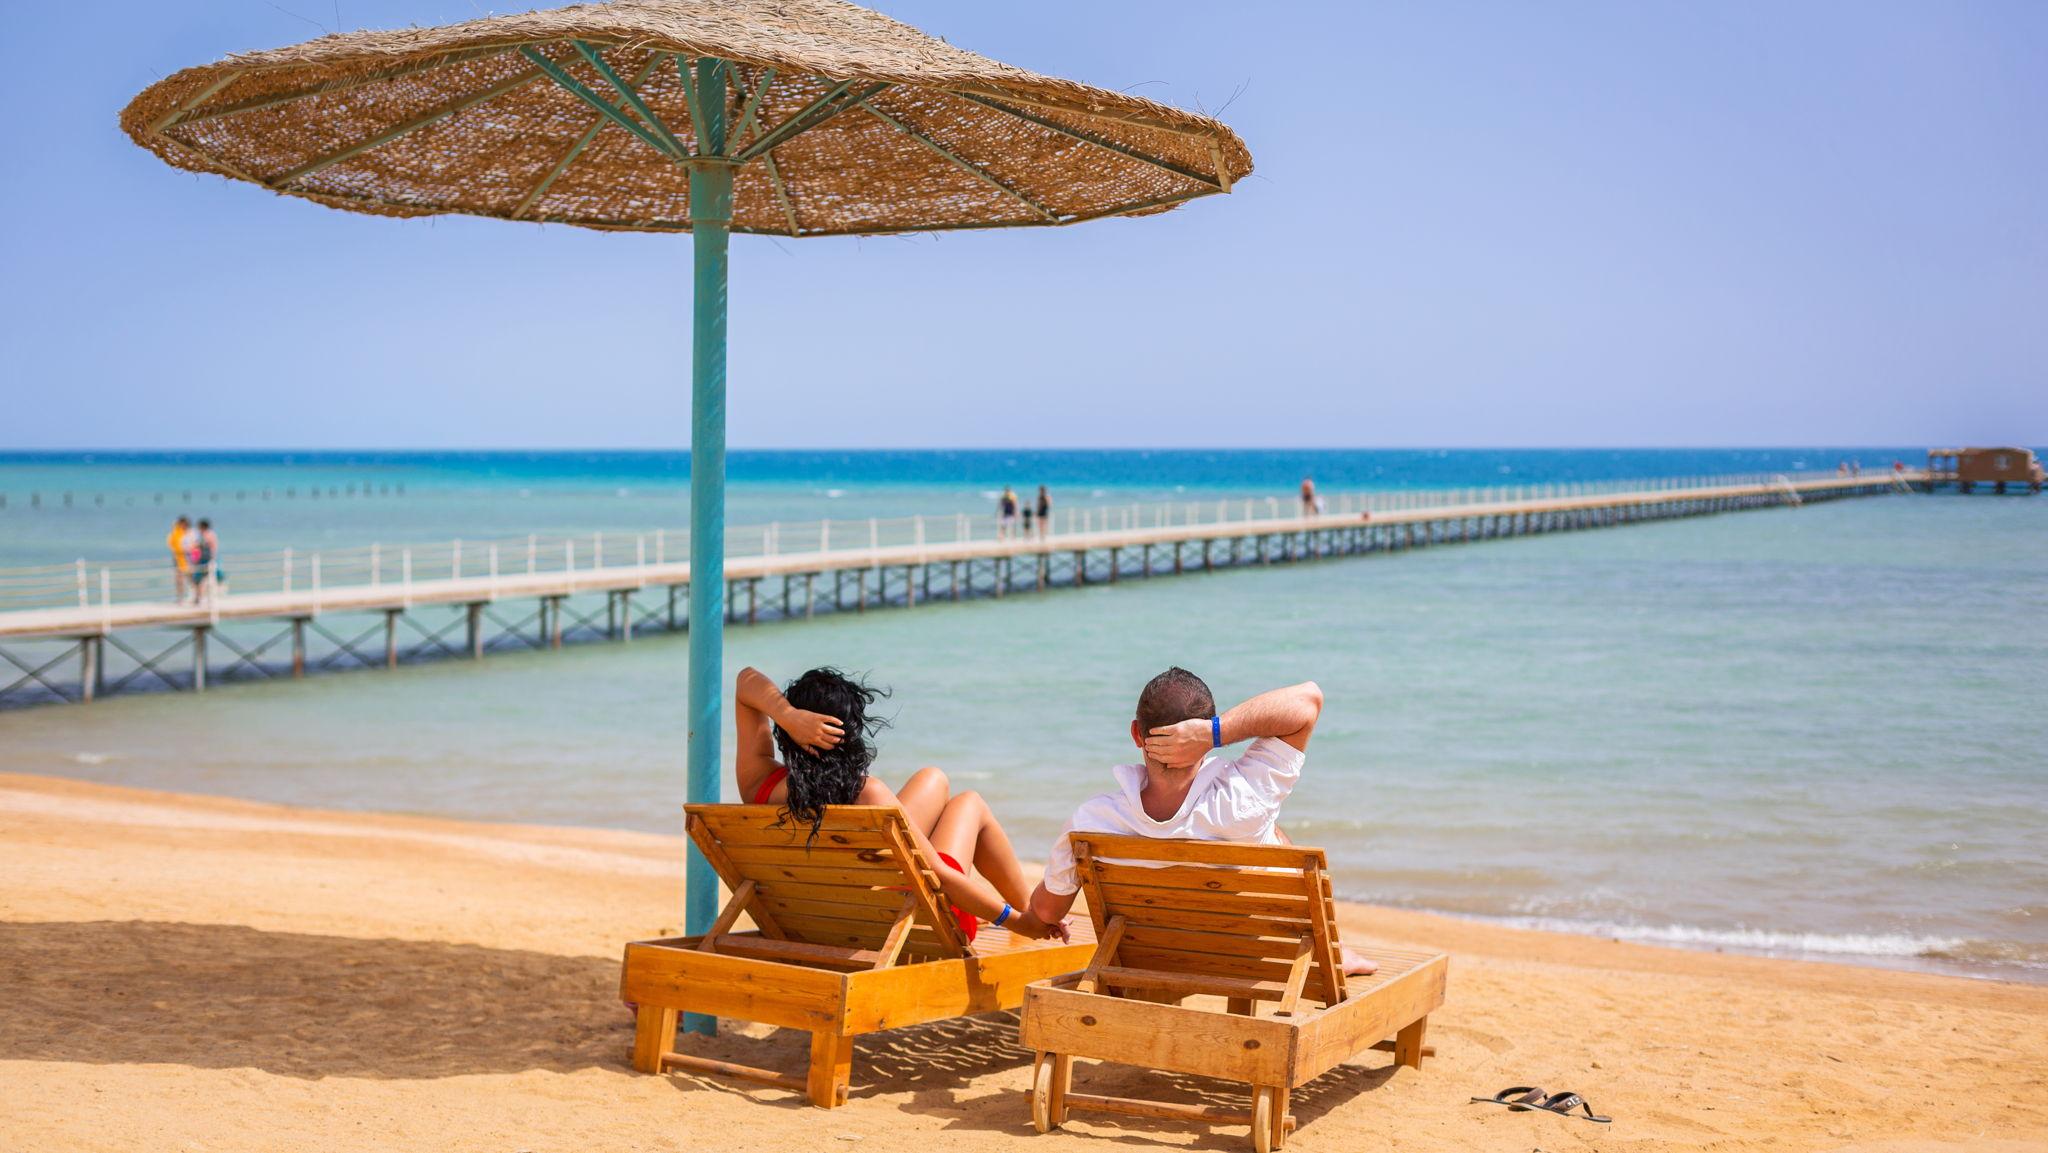 Nubians & Beaches